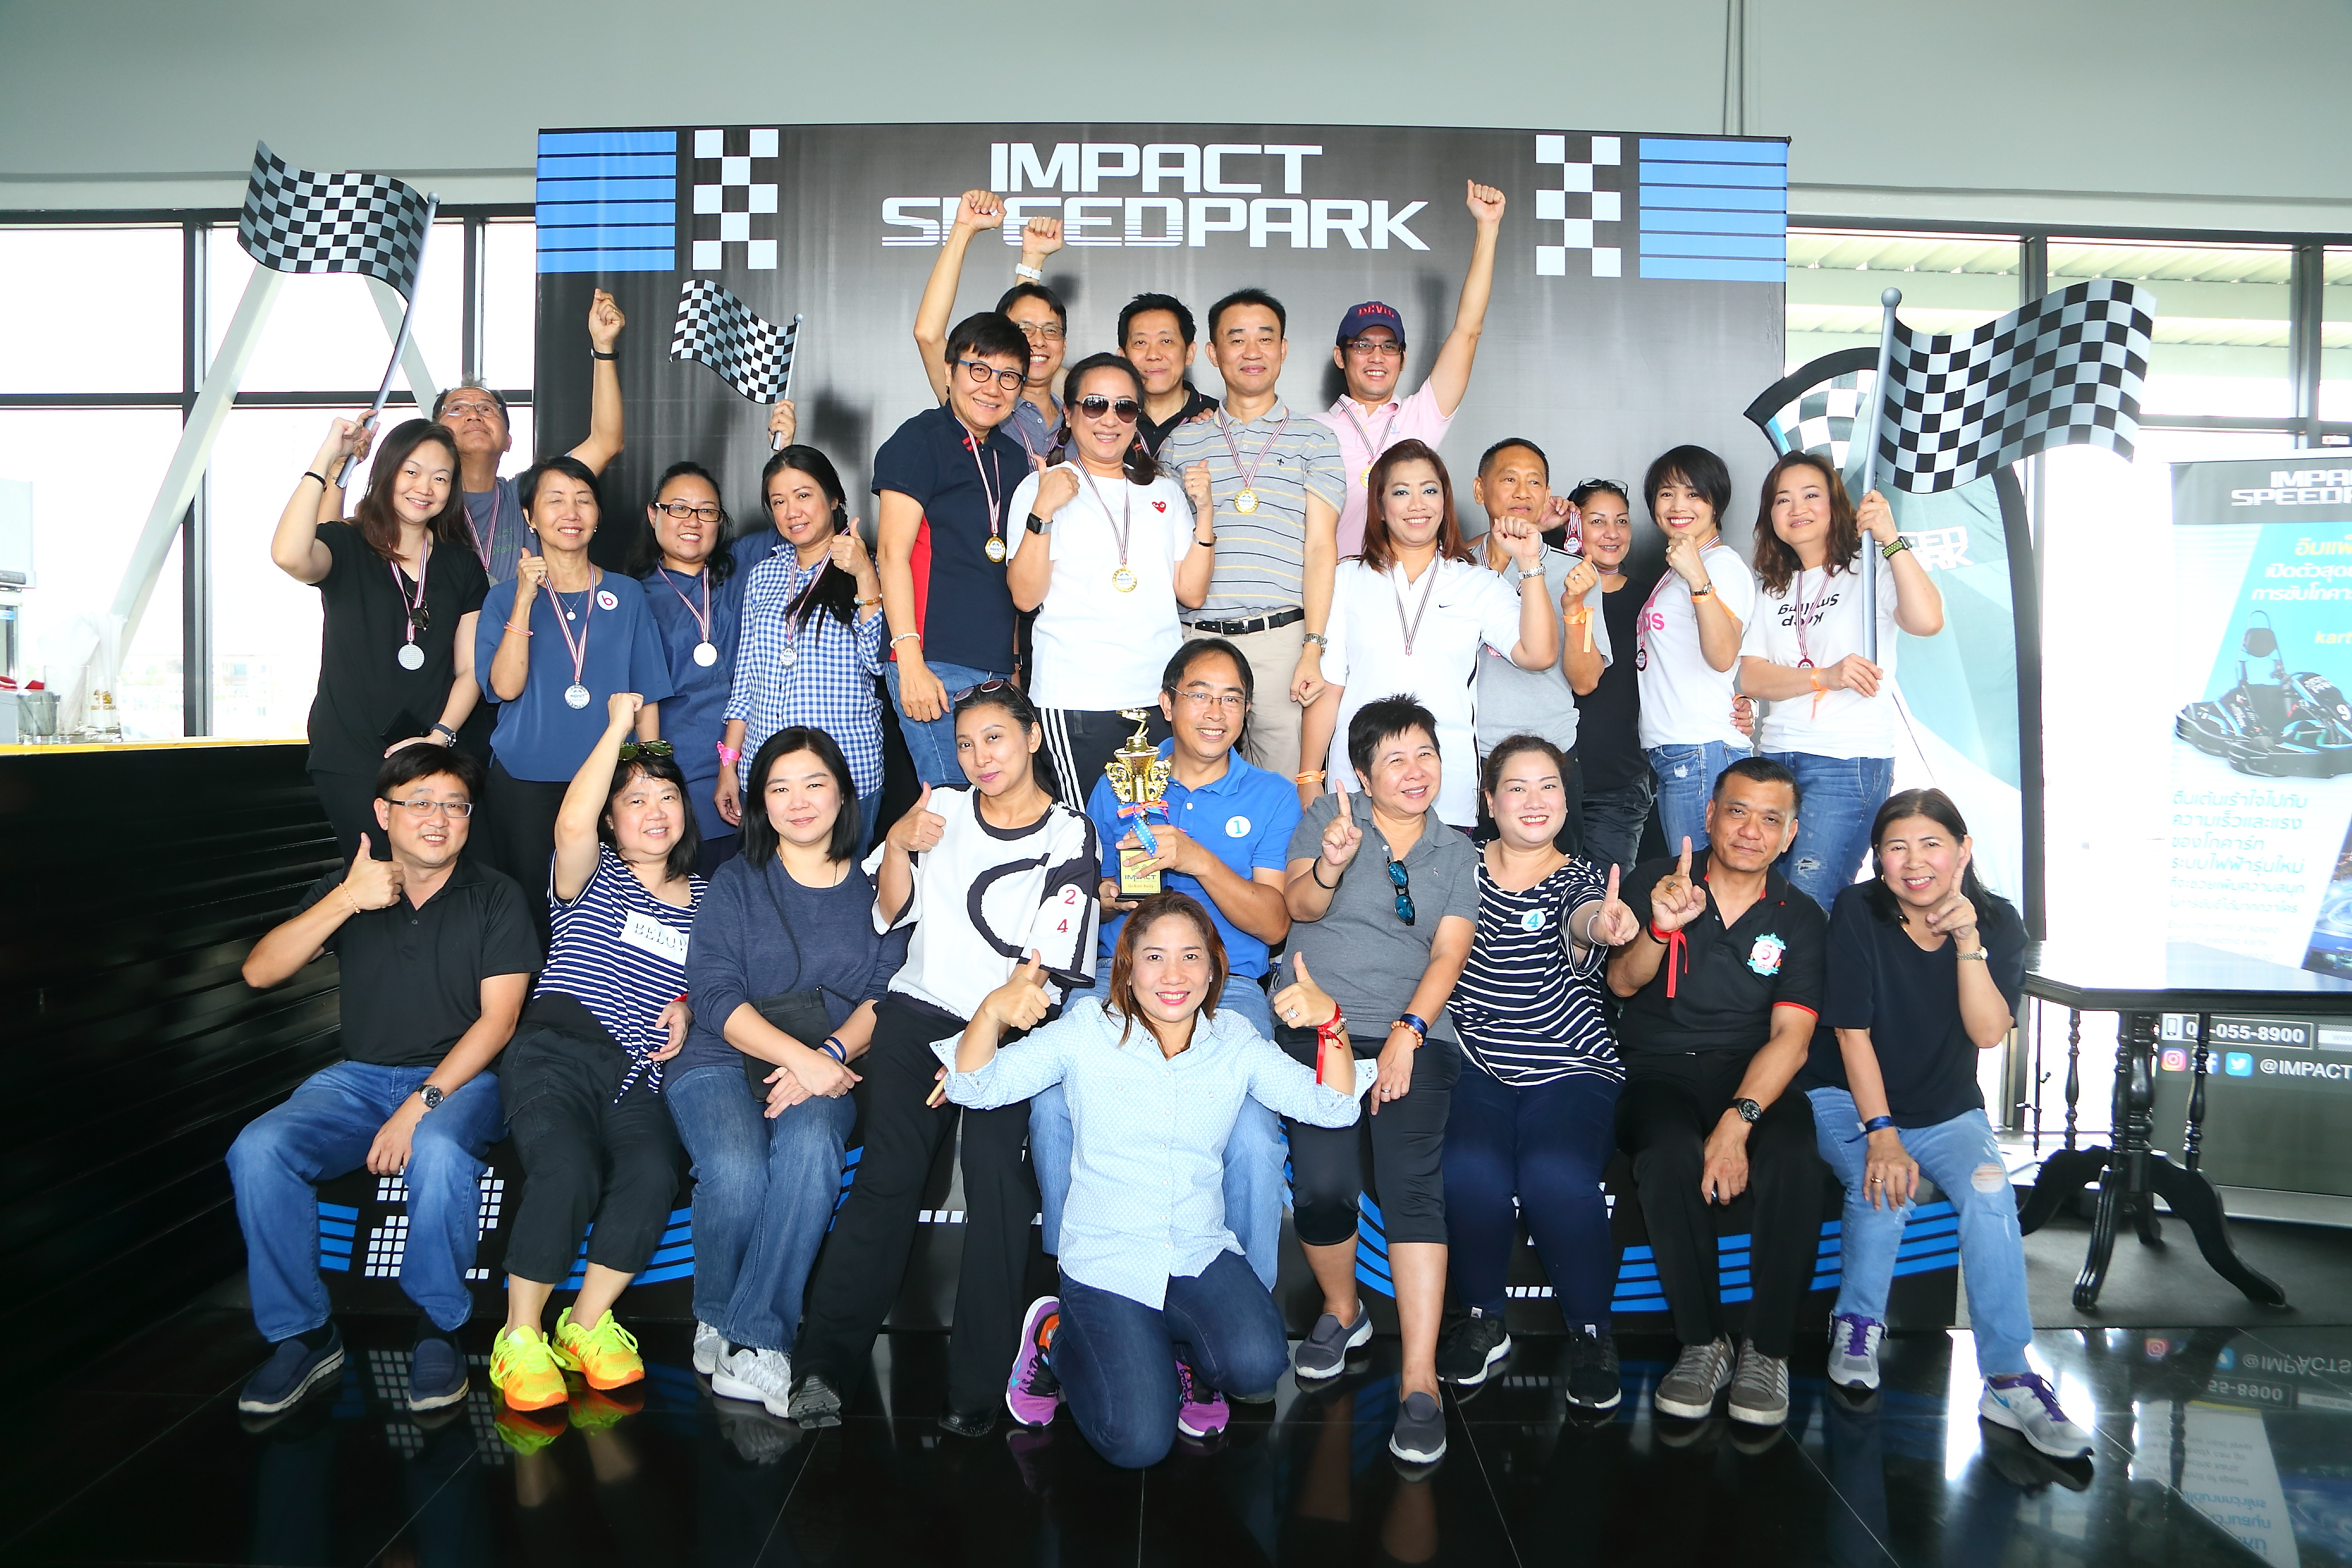 IMPACT Speed Park's team building